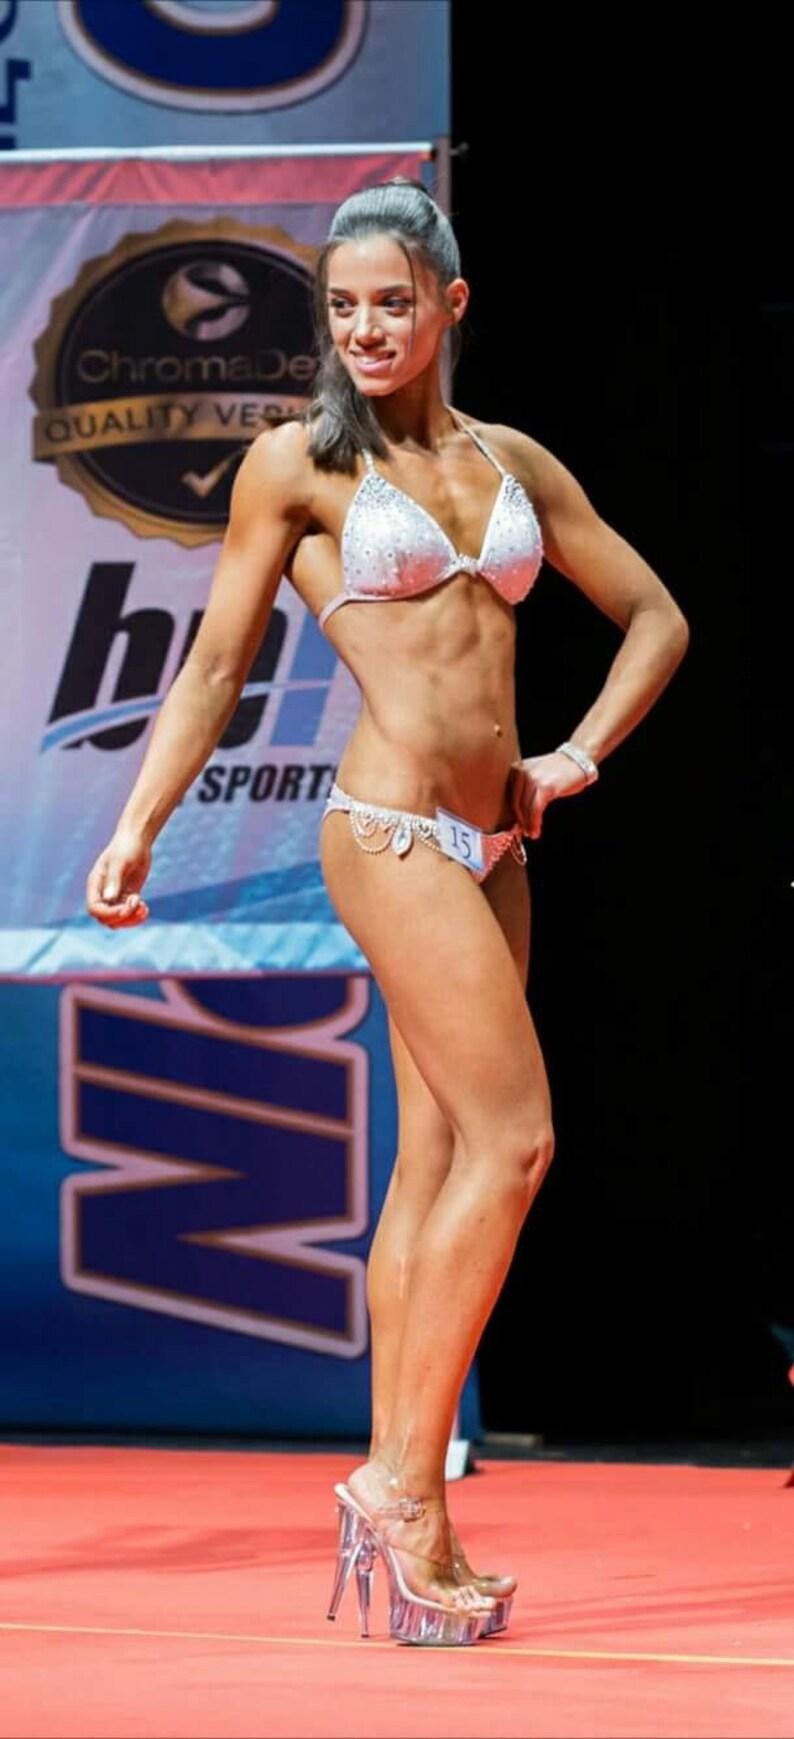 Competition bikini suit